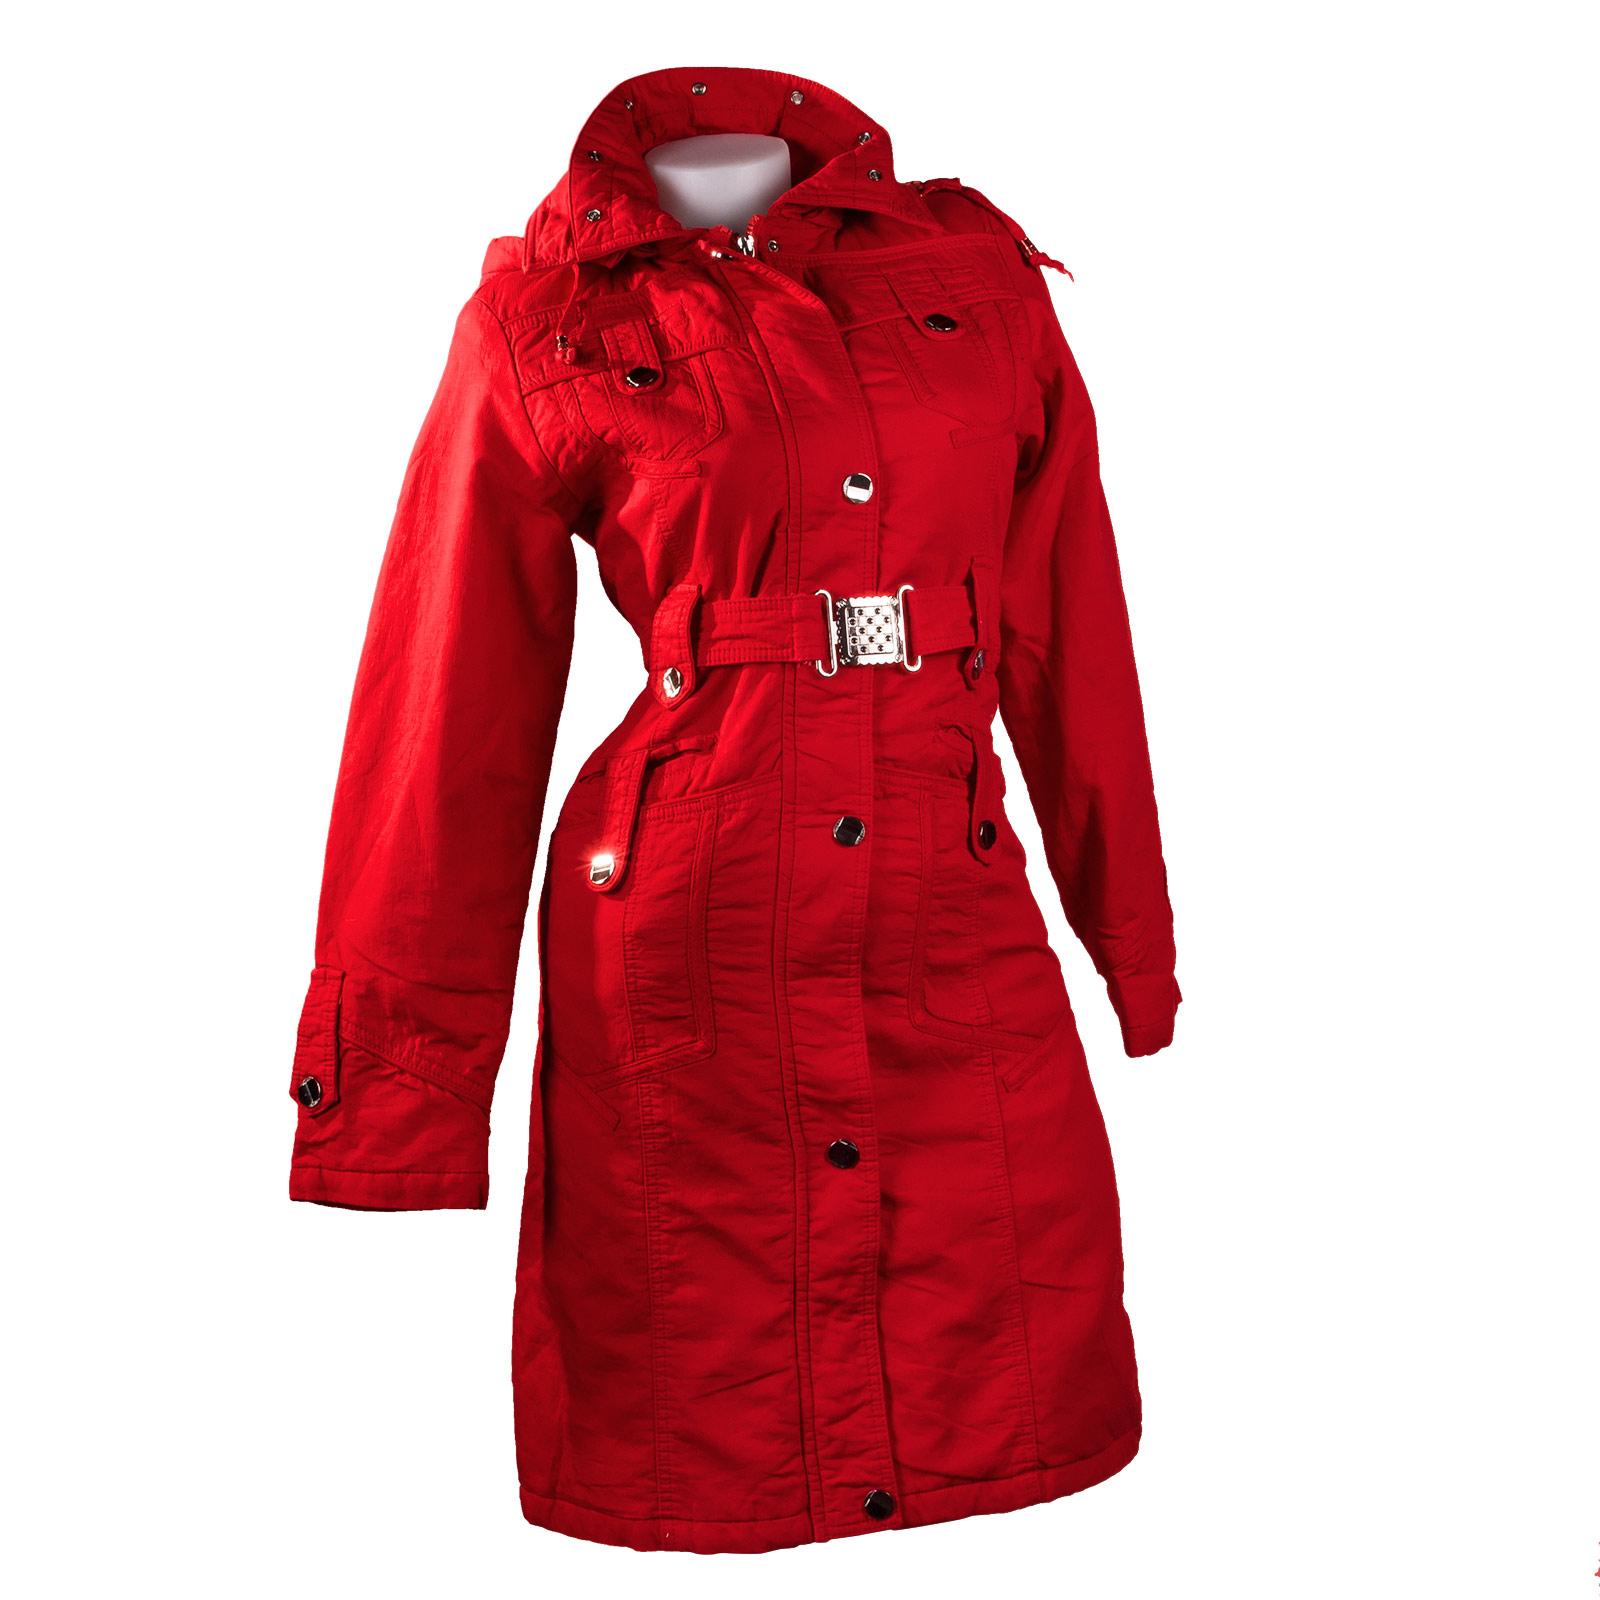 damen wintermantel lang jacke cotton winterjacke mantel. Black Bedroom Furniture Sets. Home Design Ideas